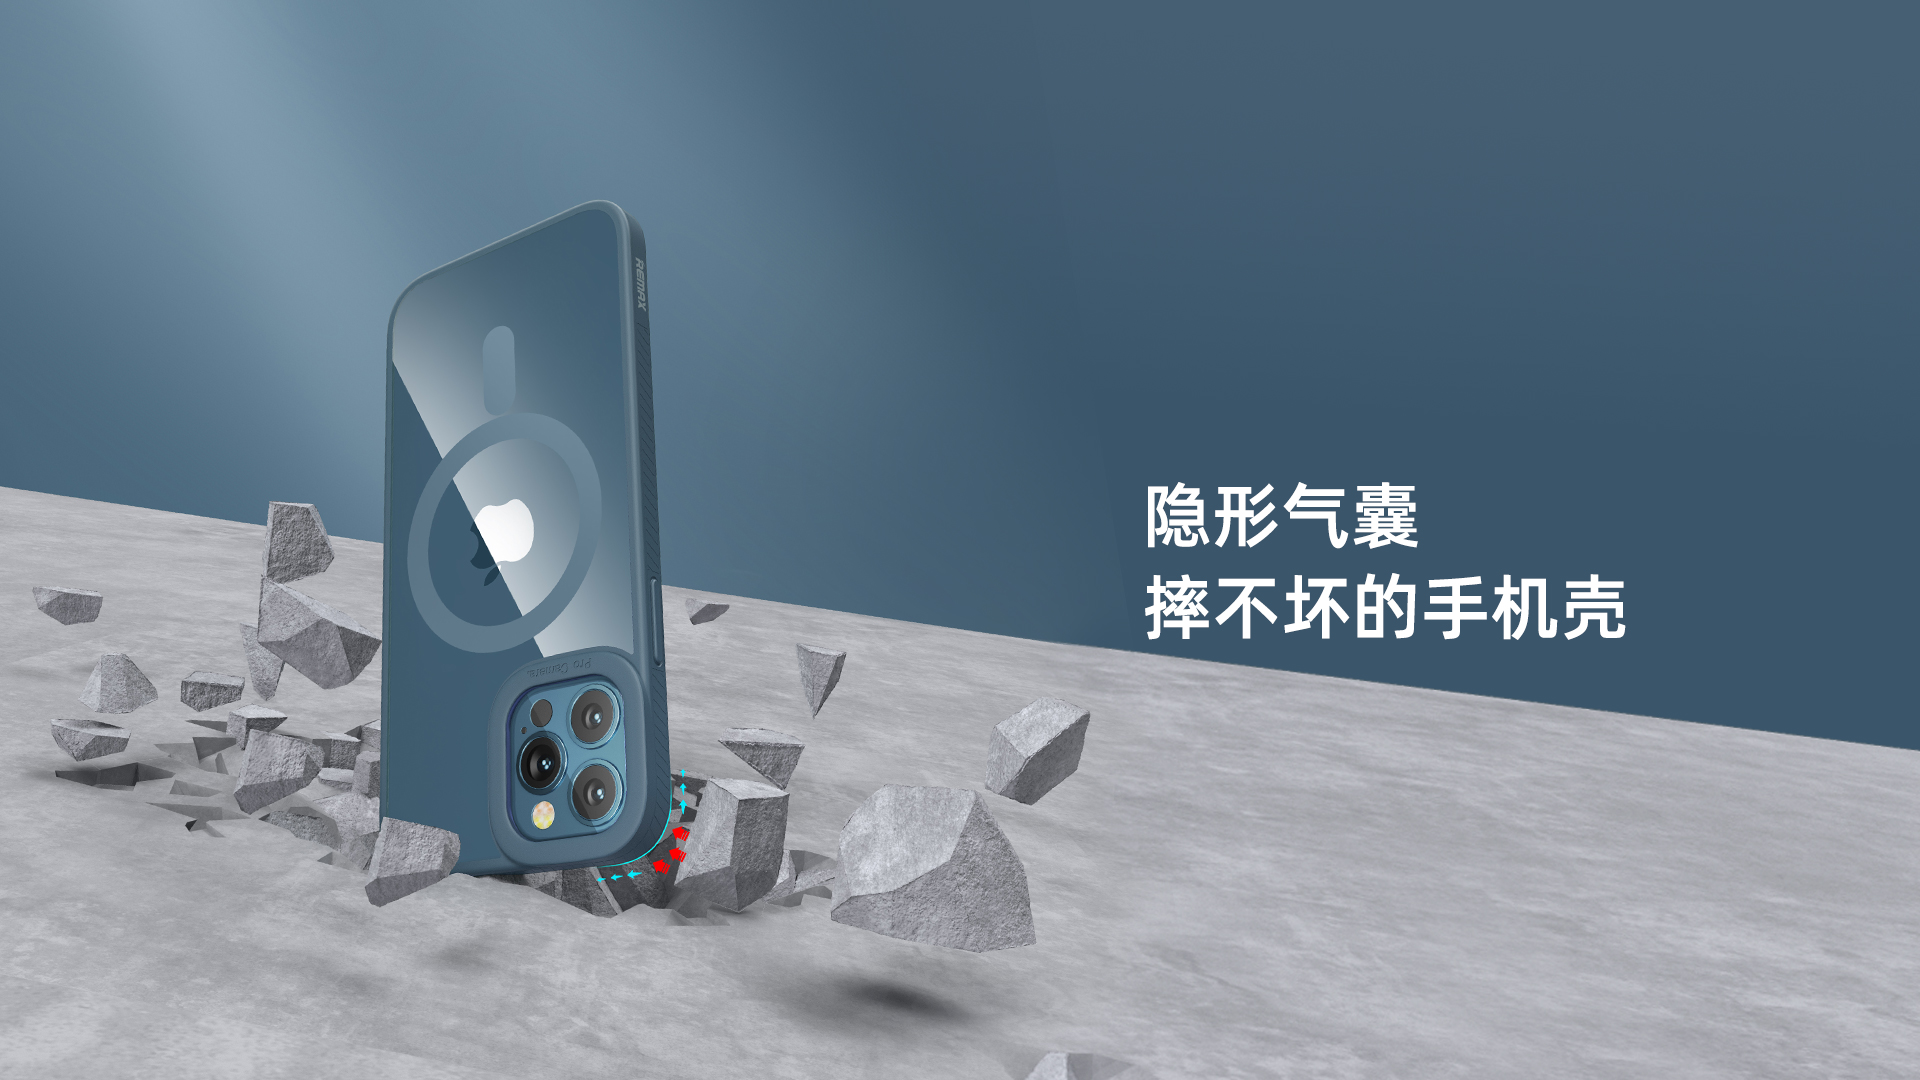 RM1698本色磁吸壳-网页_03